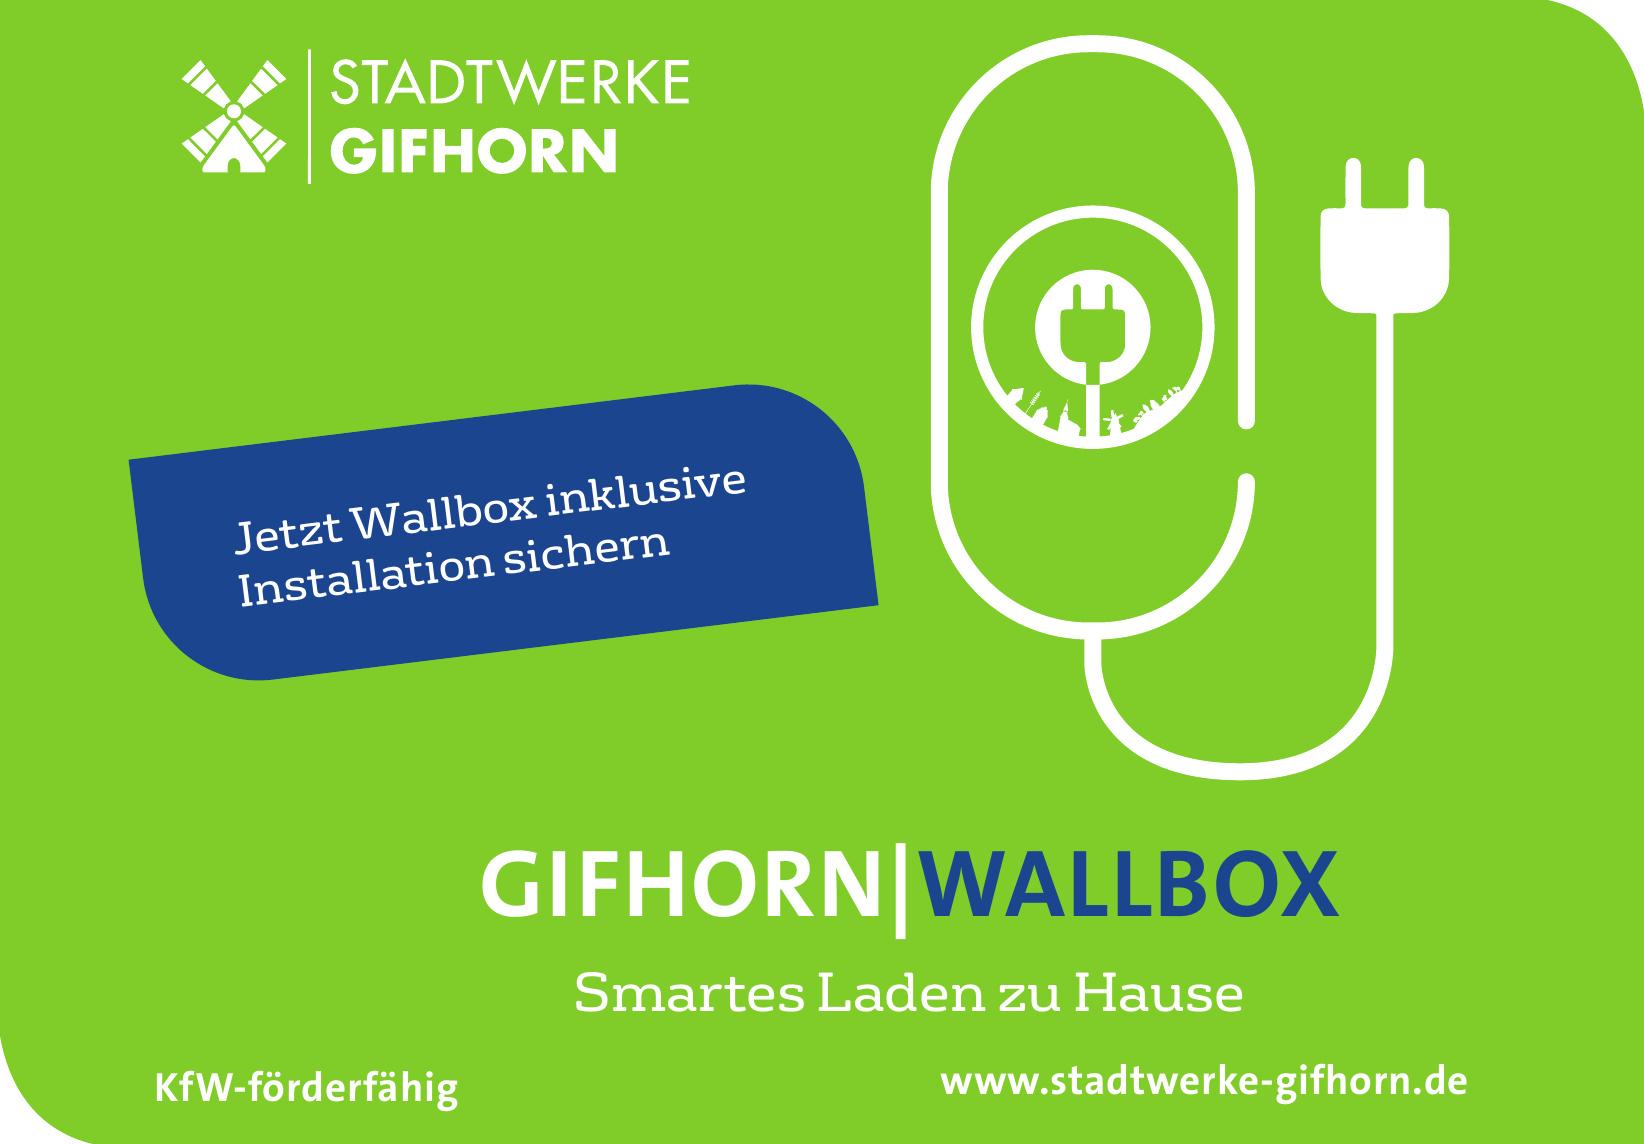 Stadtwerke Gifhorn